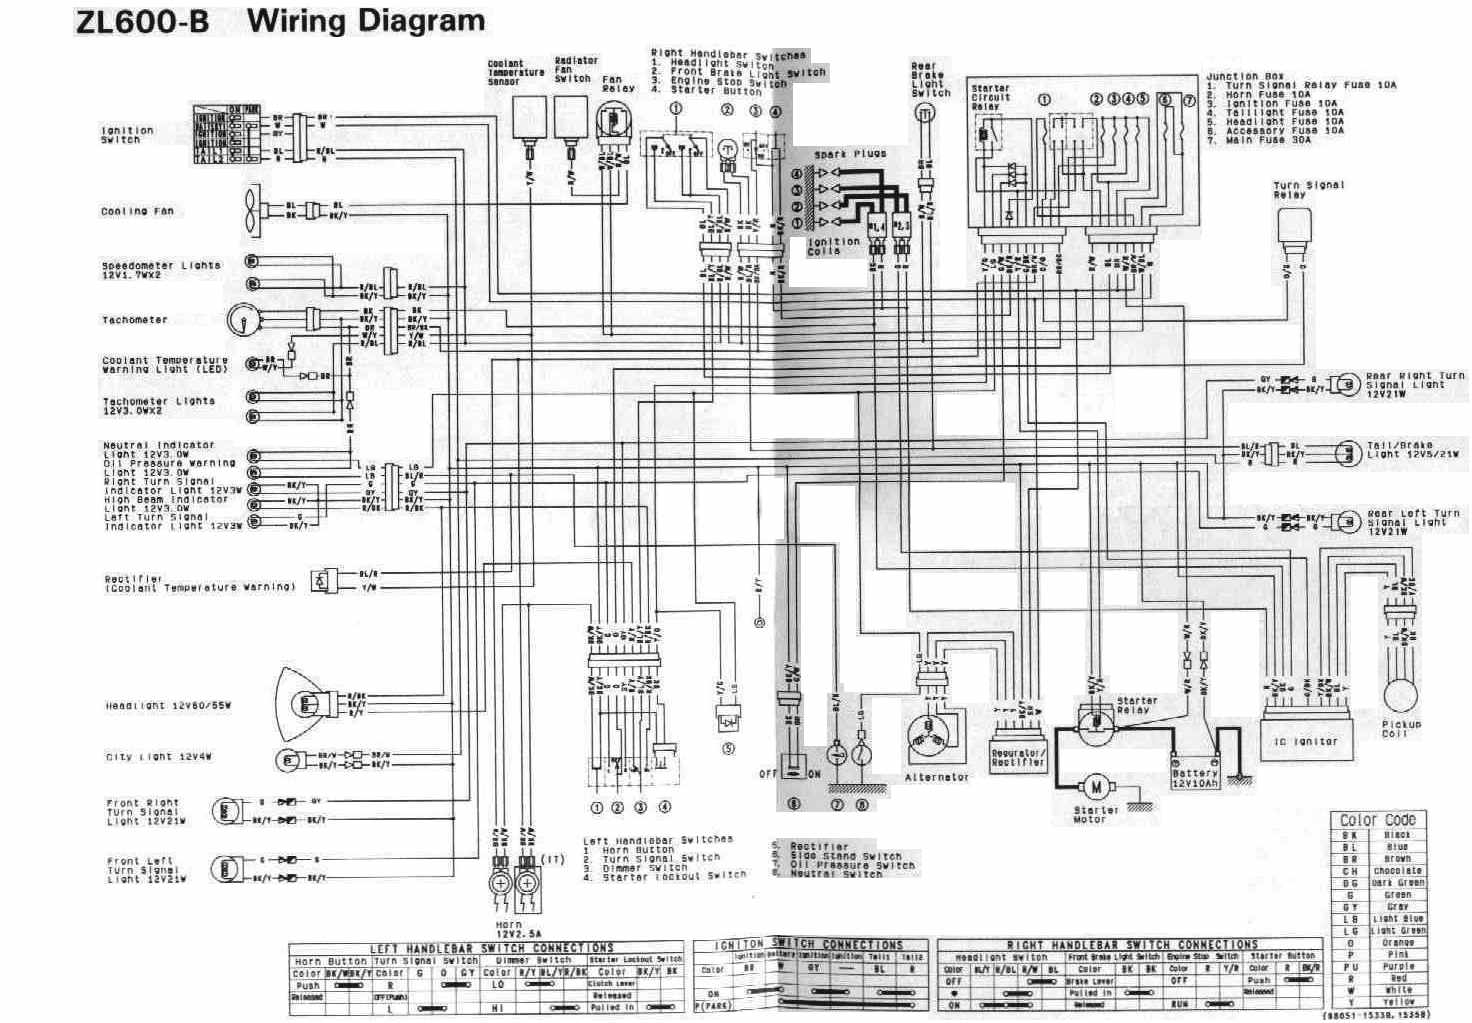 Kawasaki ZL600 1996 Motorcycle Wiring Diagram All About Wiring